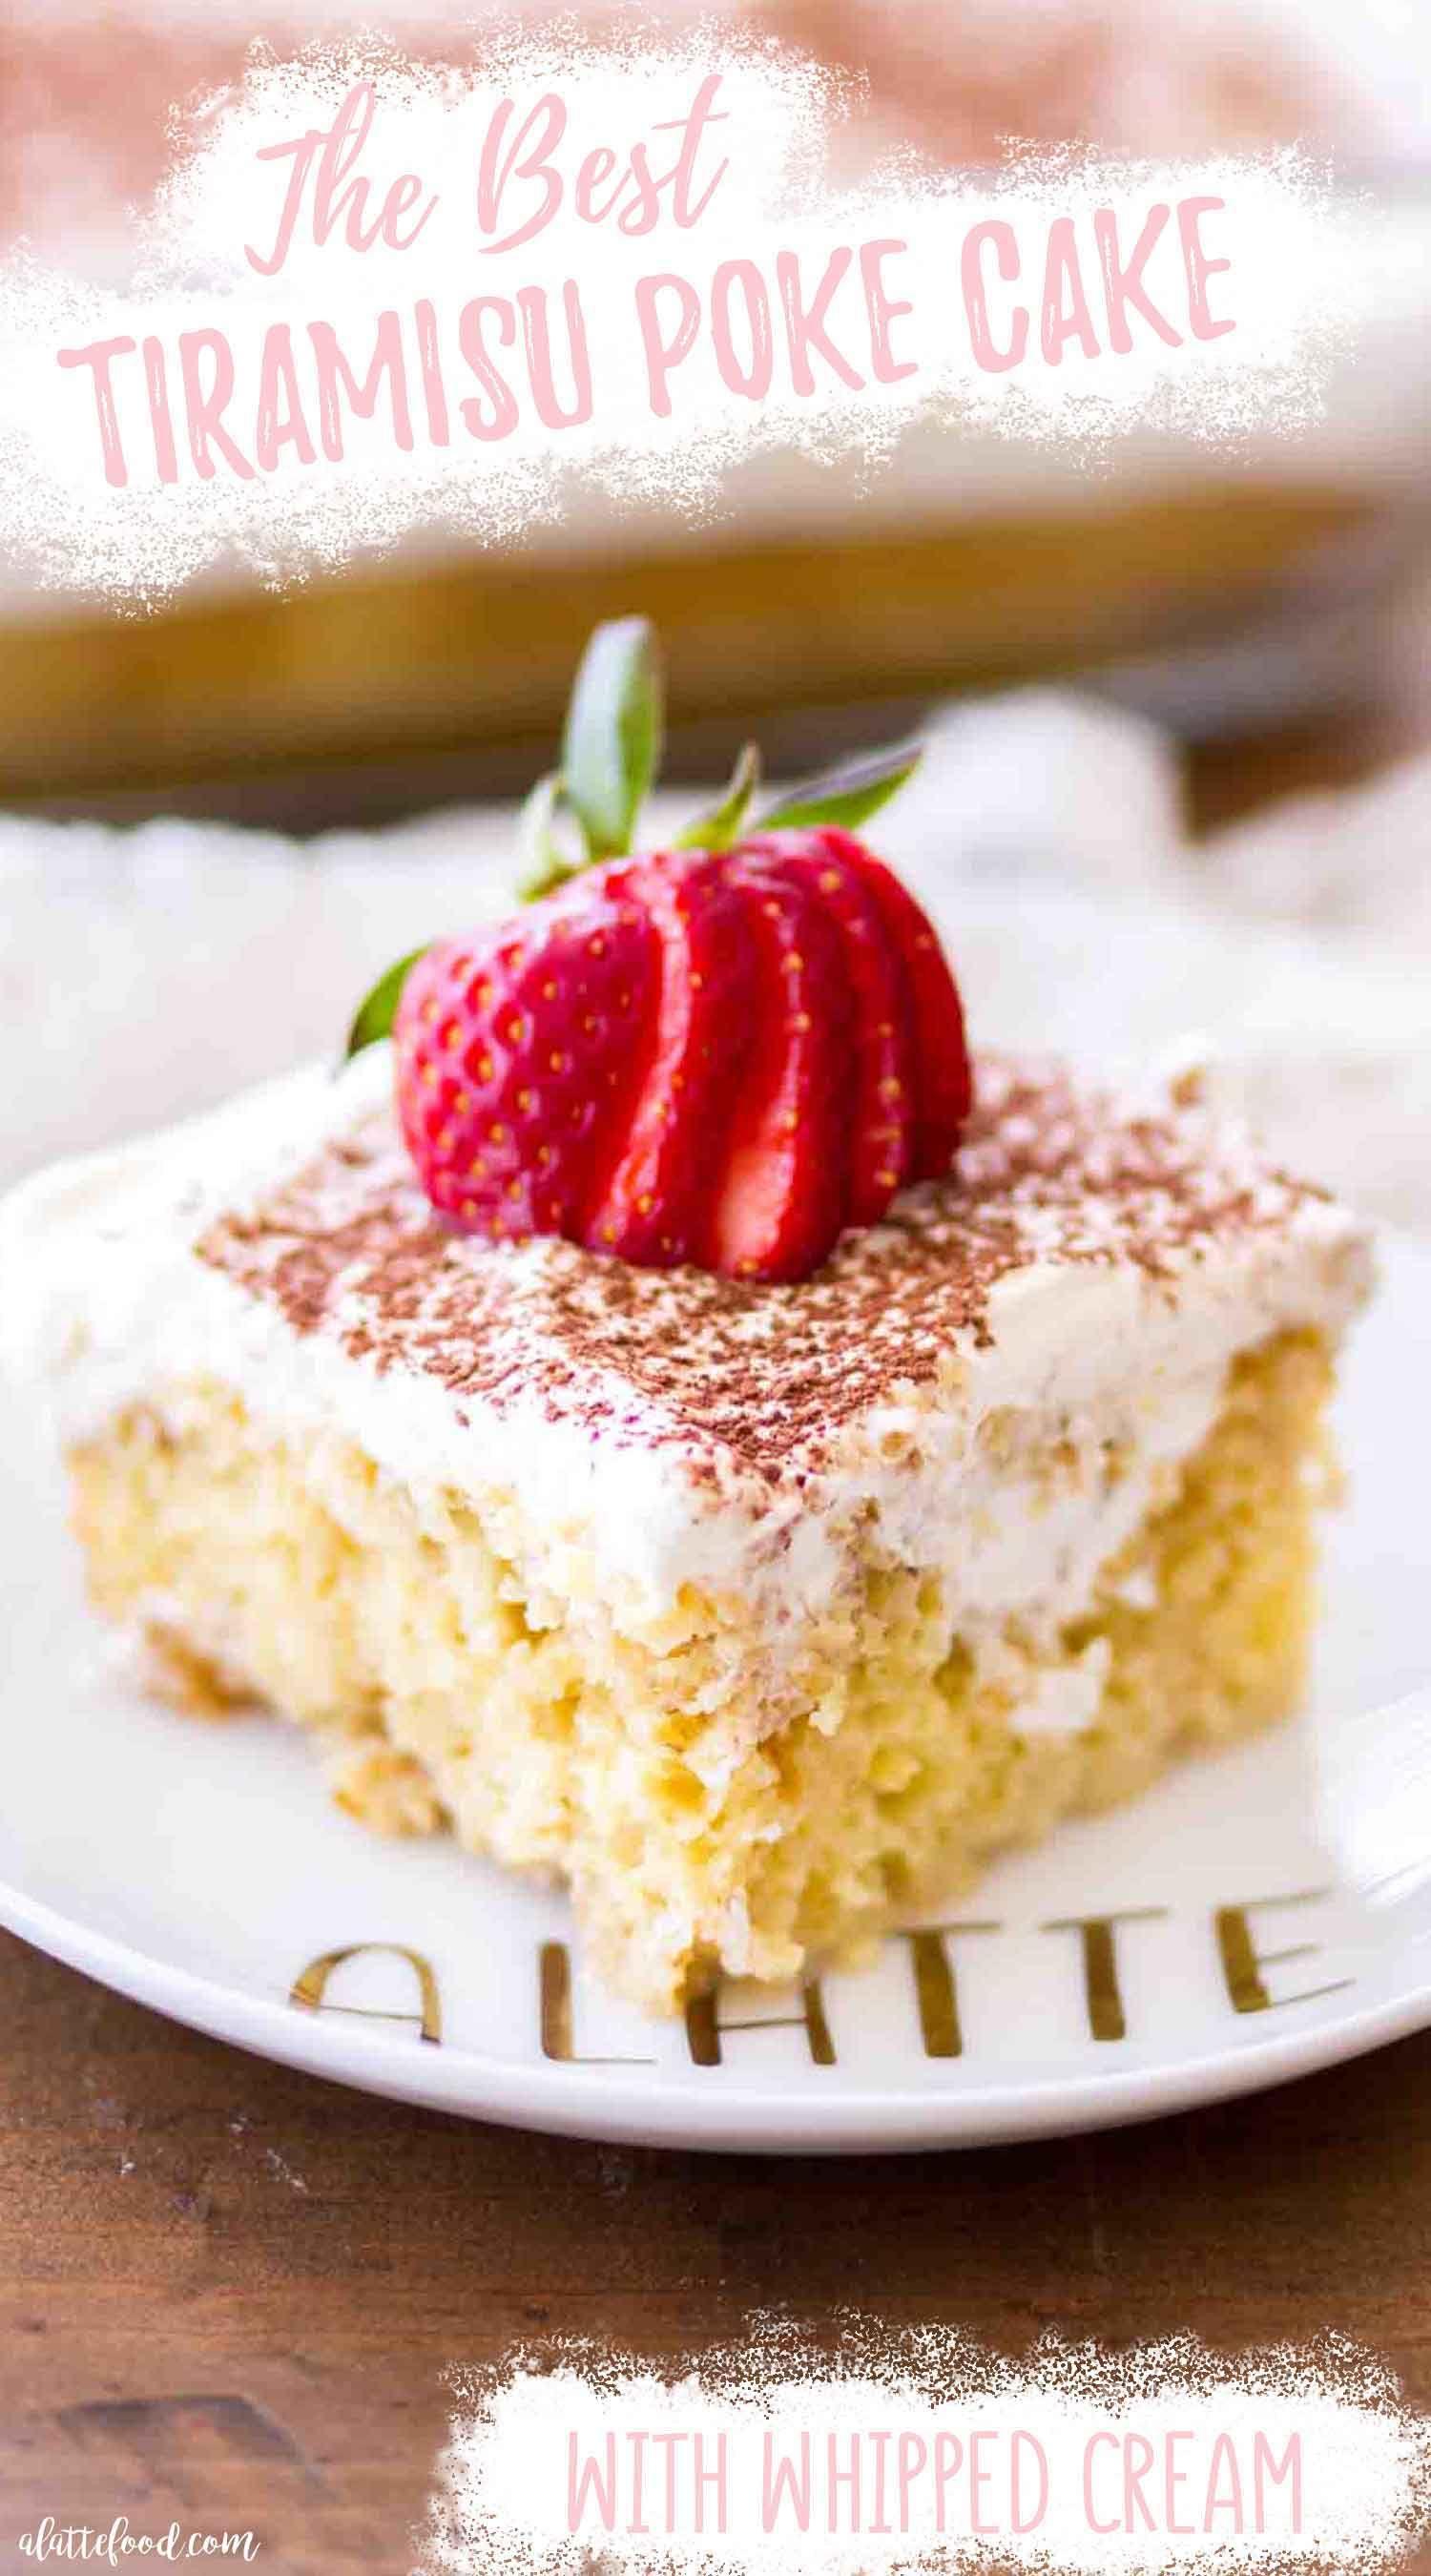 Easy Tiramisu Poke Cake In 2020 Poke Cake Recipes Poke Cake Favorite Dessert Recipes